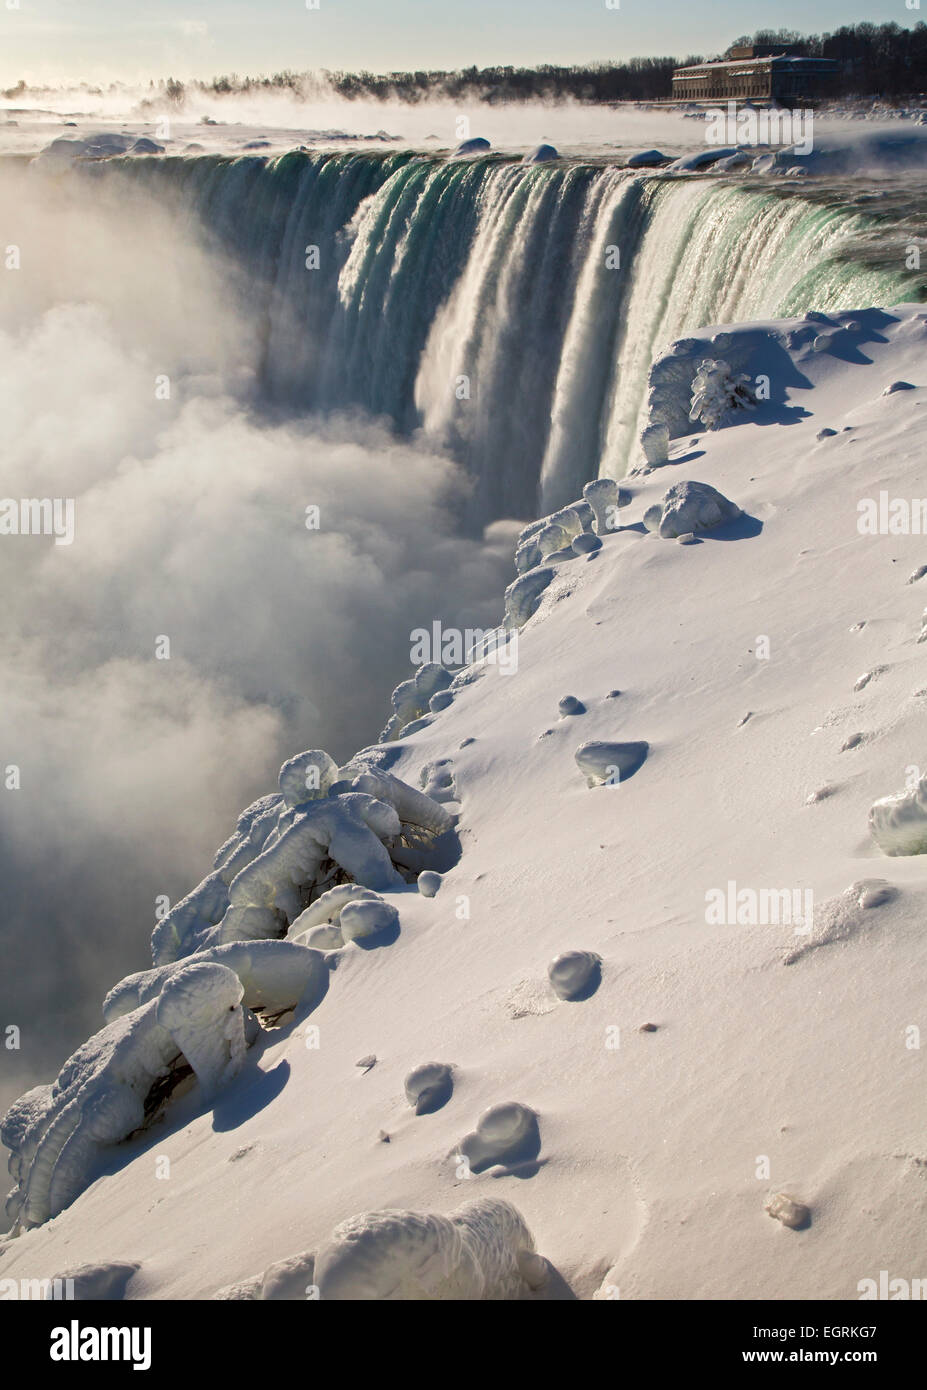 Niagara Falls, Ontario - Niagara Falls' Canadian Falls, or Horseshoe Falls, in winter. - Stock Image